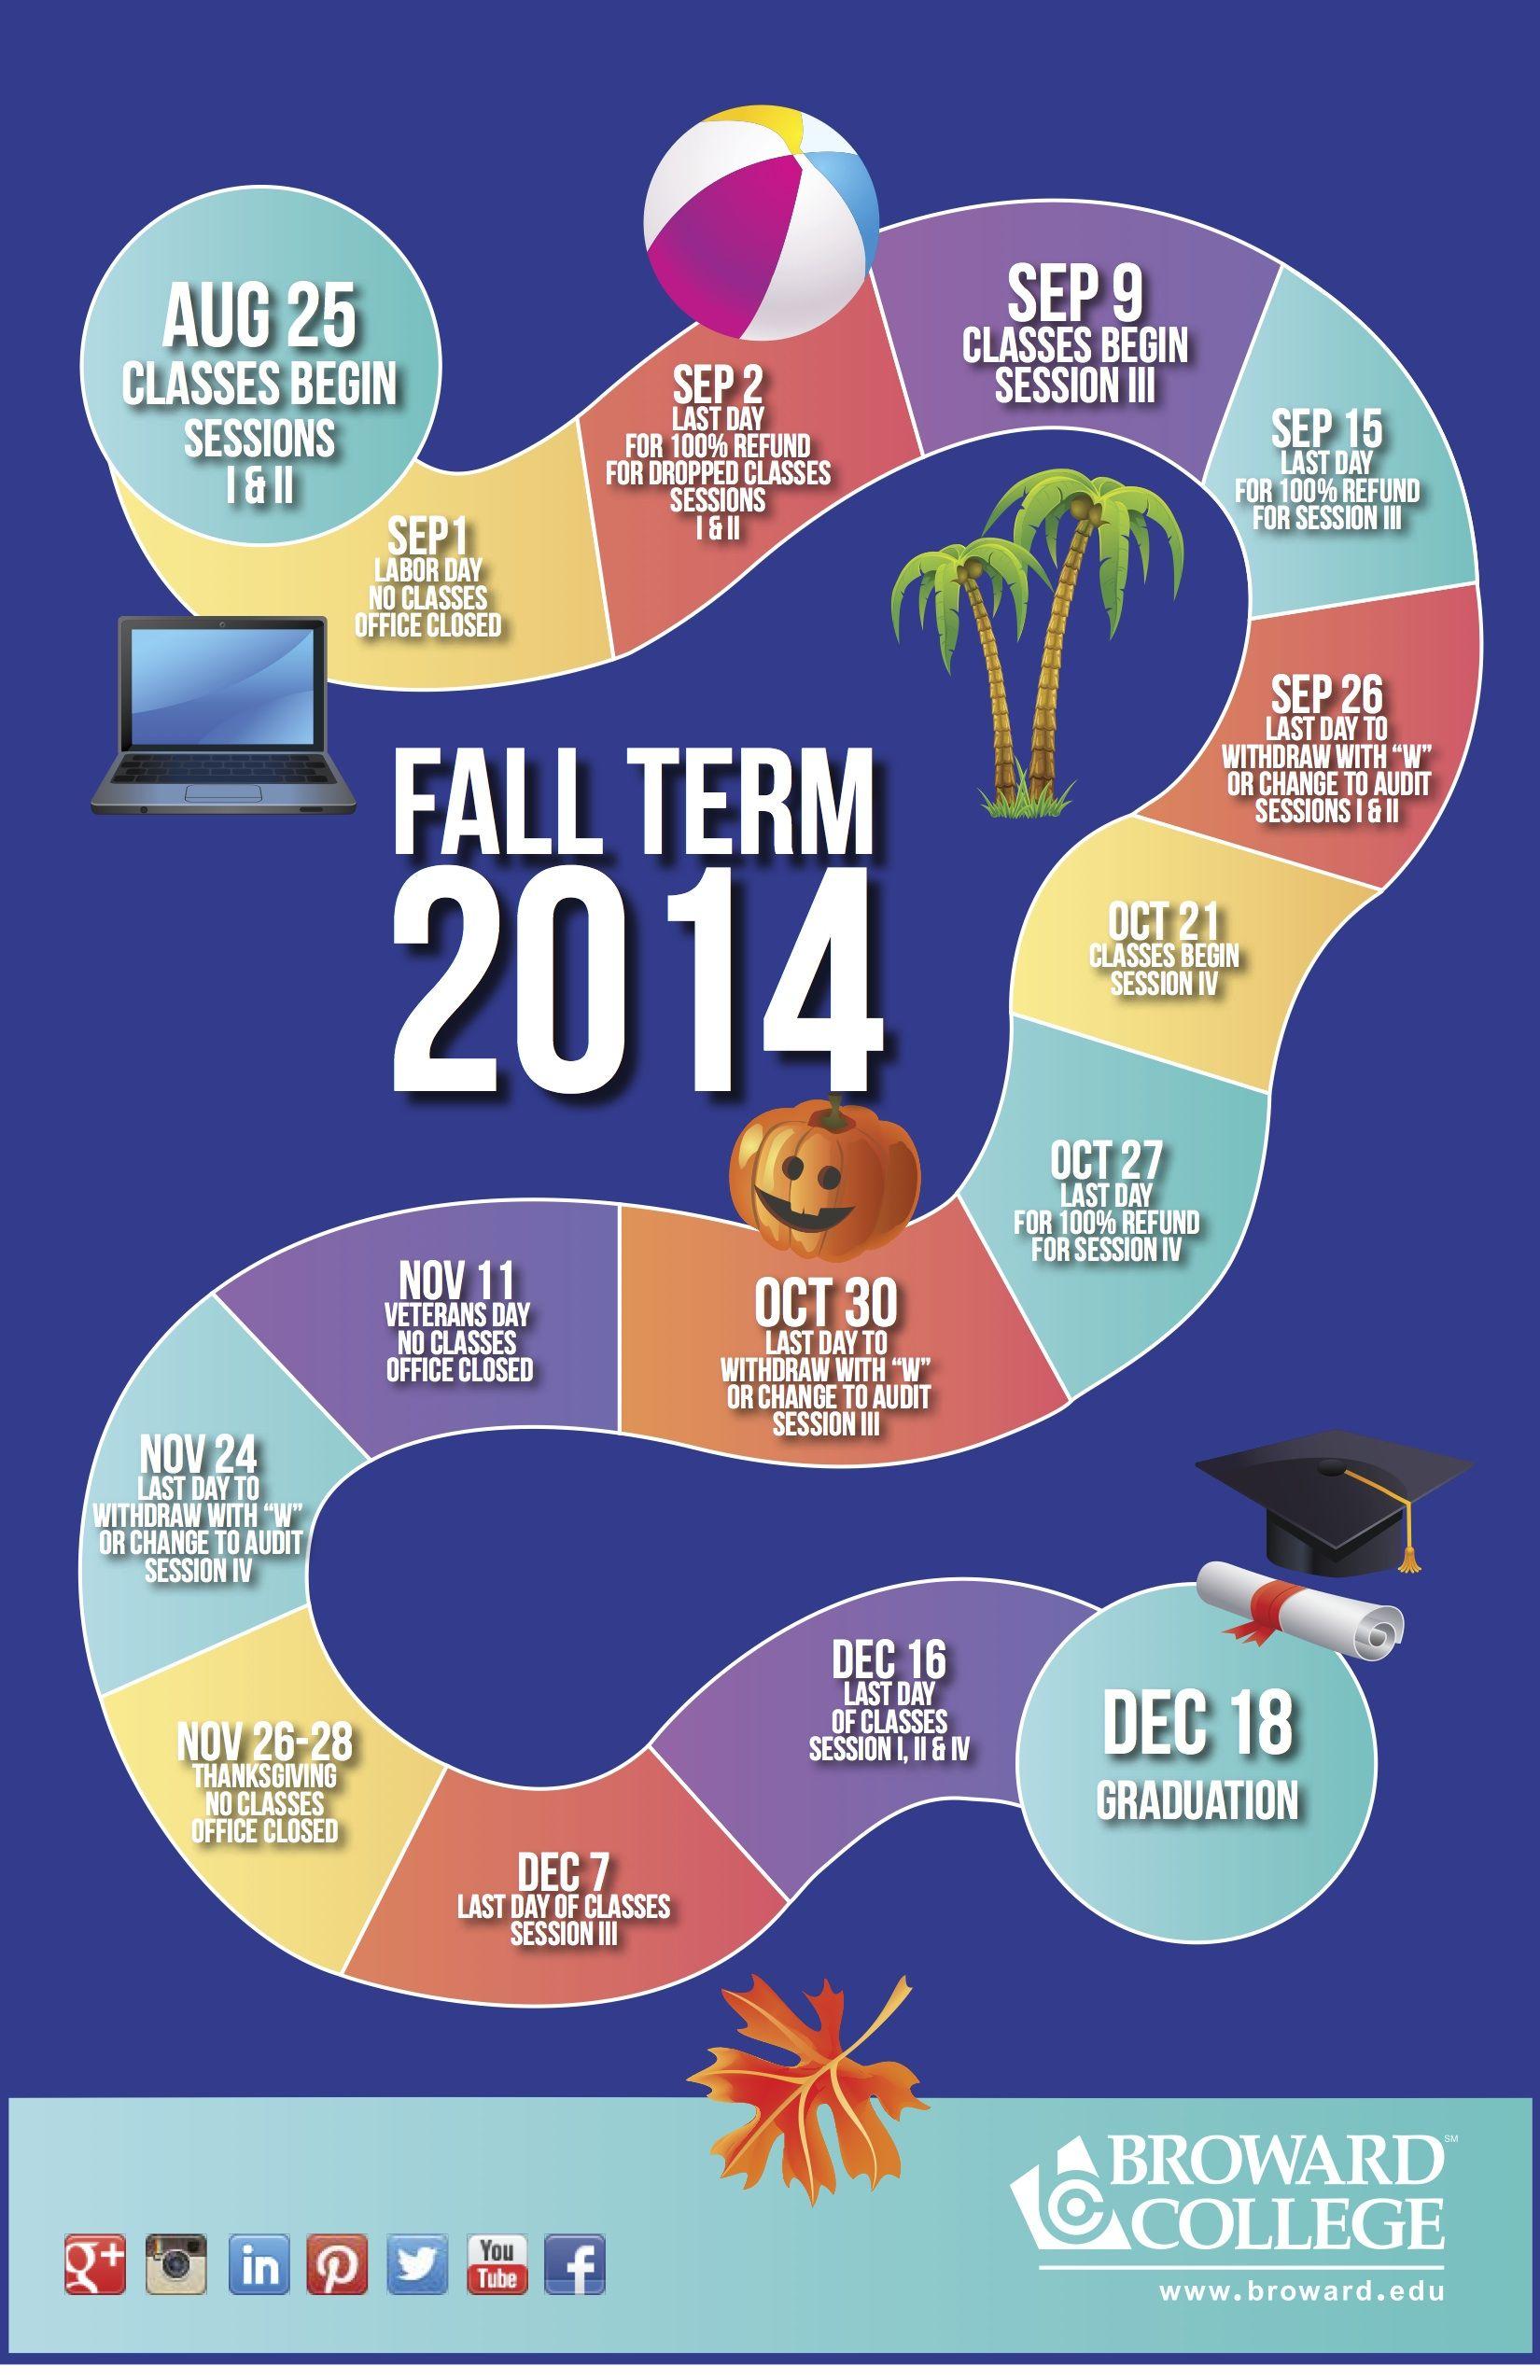 20++ Broward college health careers ideas